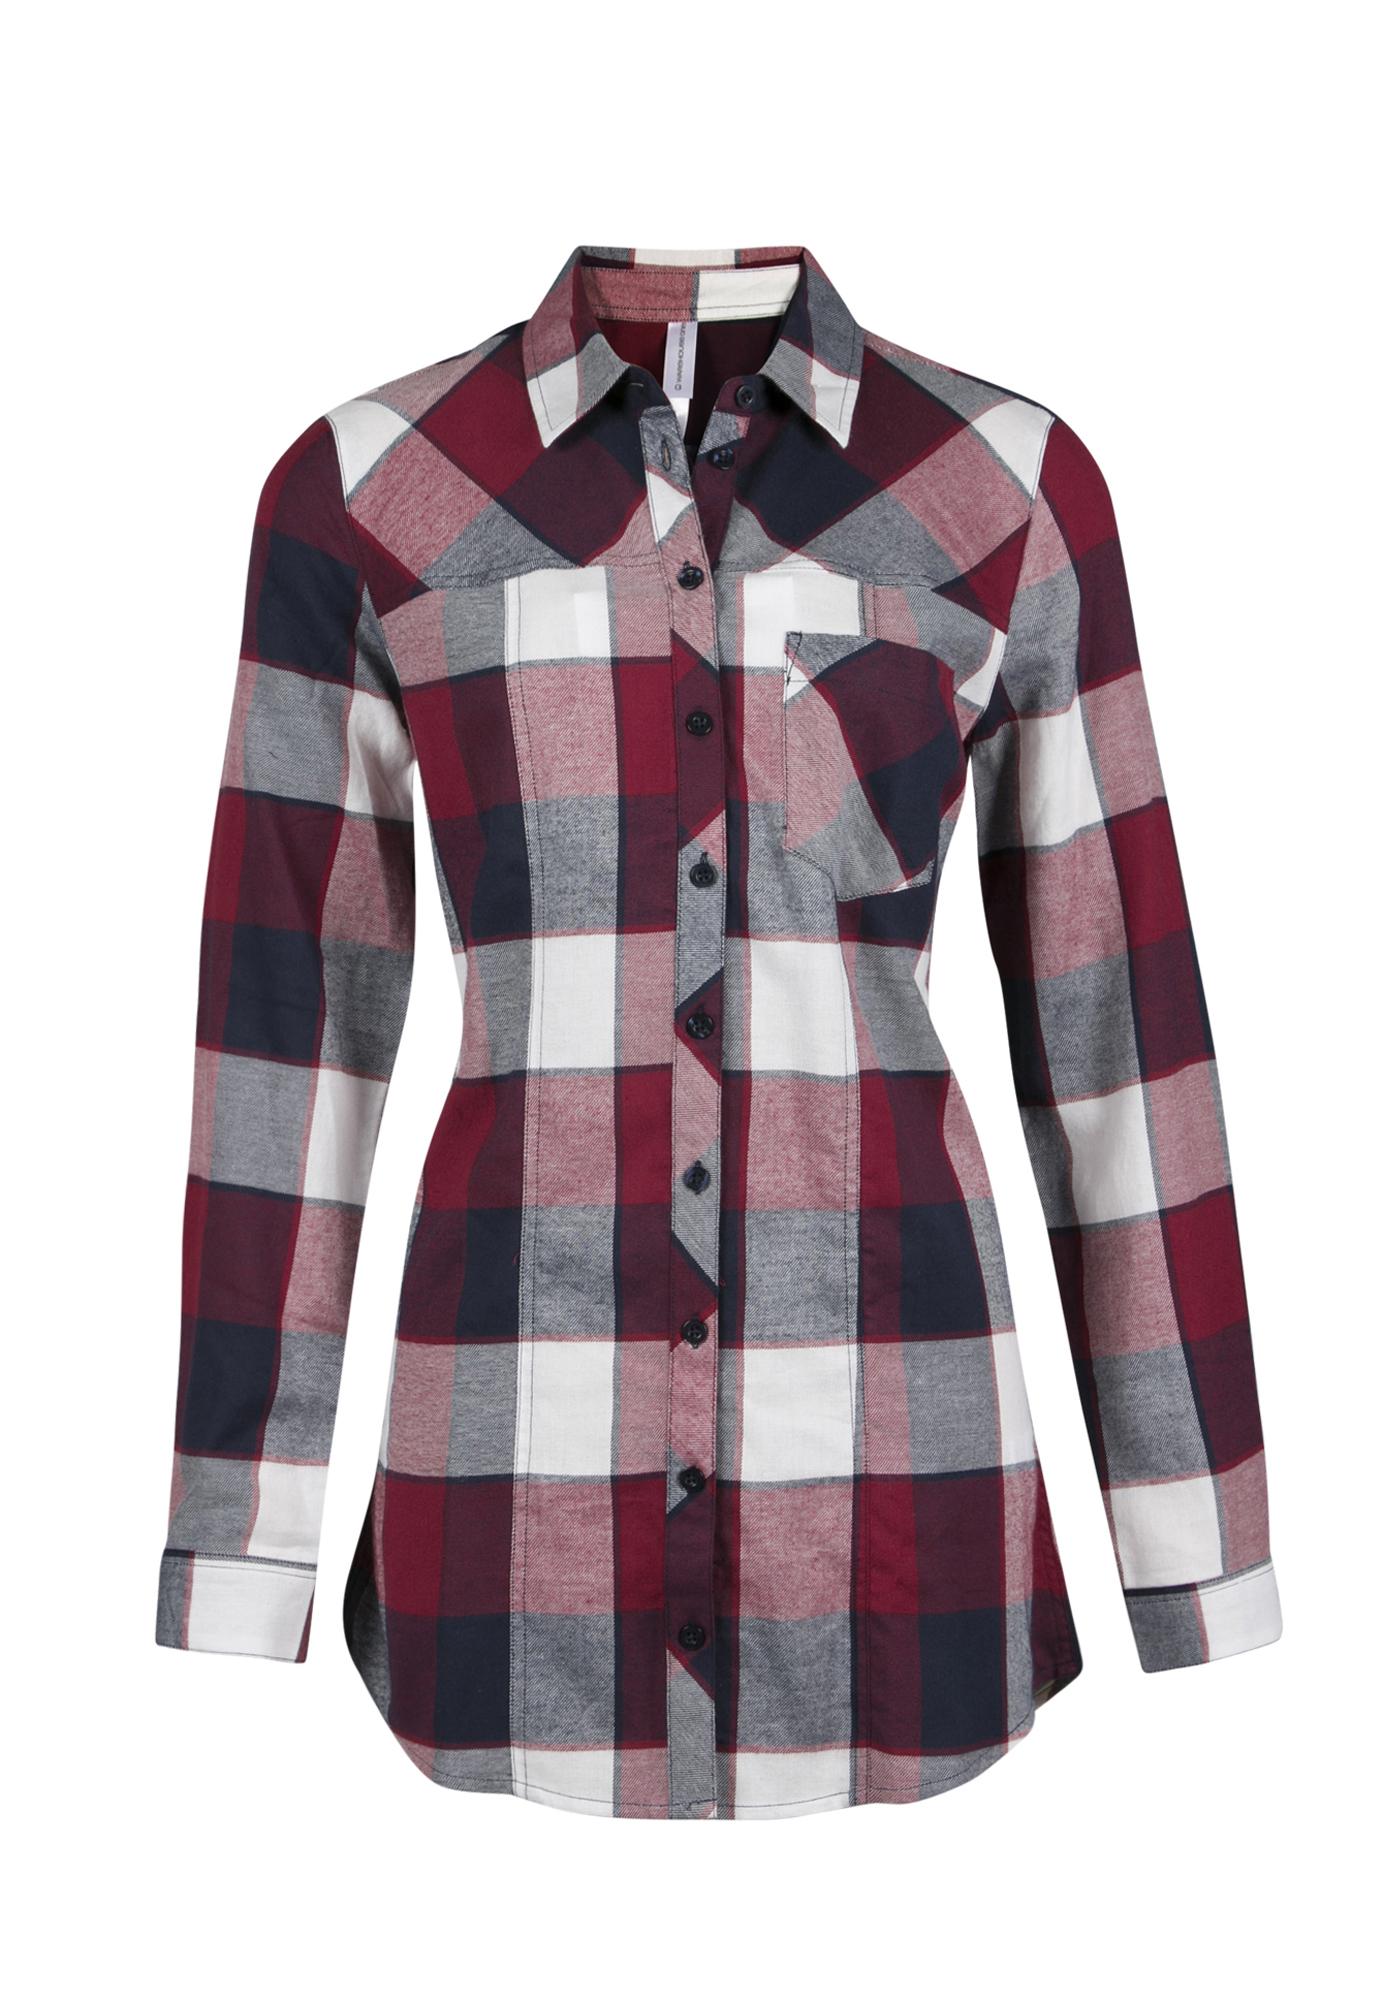 Ladies 39 flannel plaid tunic shirt for Flannel plaid shirts for women